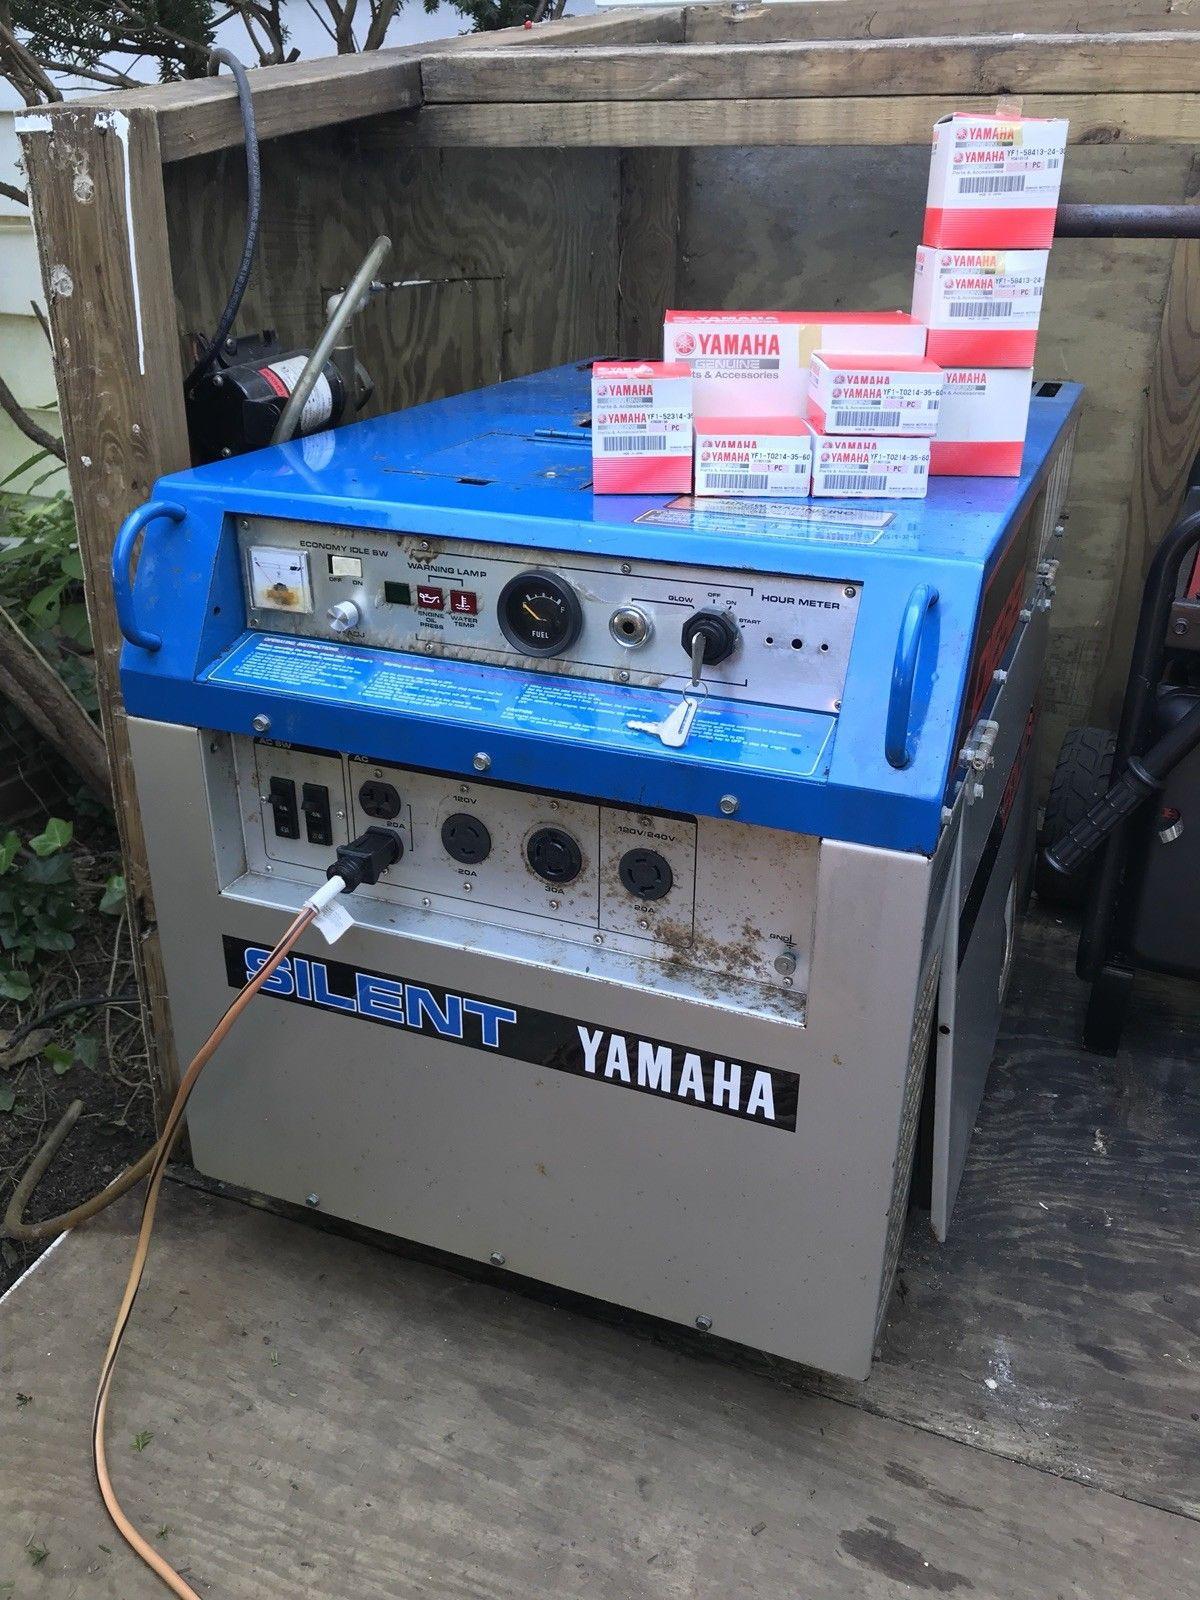 Yamaha Quiet Diesel Generator 5 5Kw asking $1000 00 - The